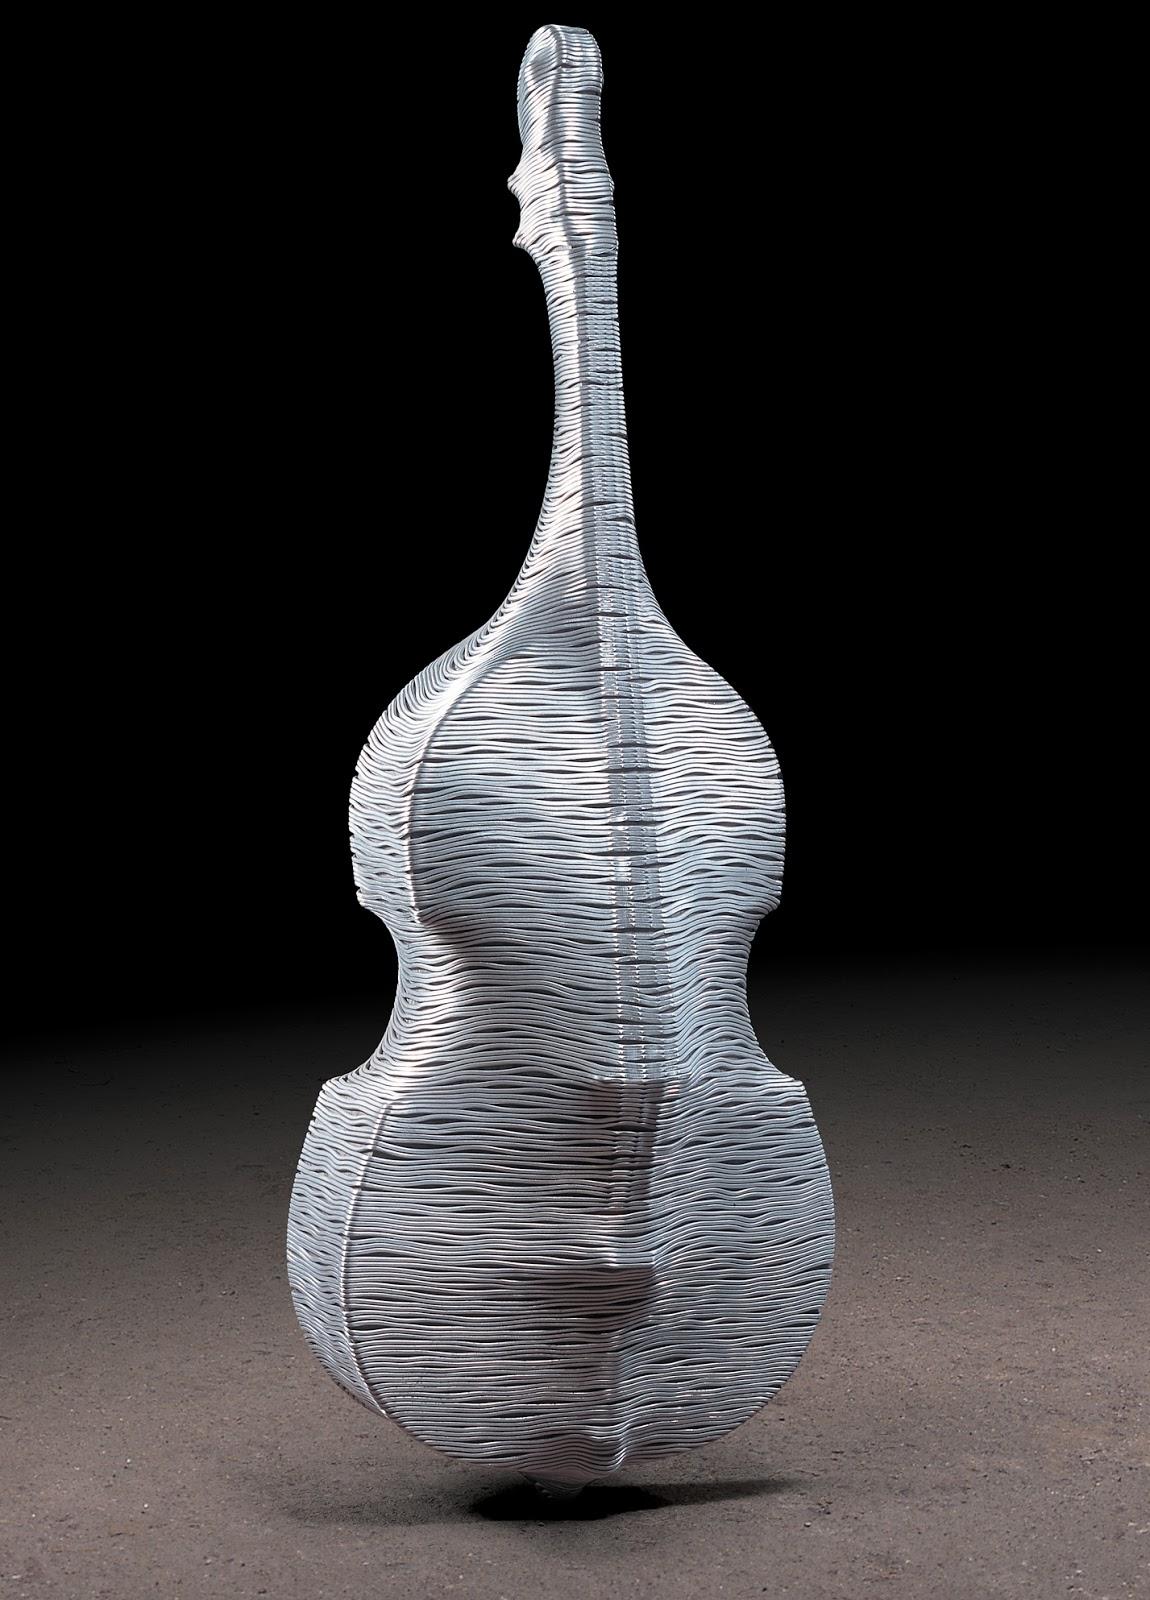 11-Contrabass-Park-Seung-Mo-South-Korean-Artist-&-Sculptor-Wire-Sculpture-www-designstack-co